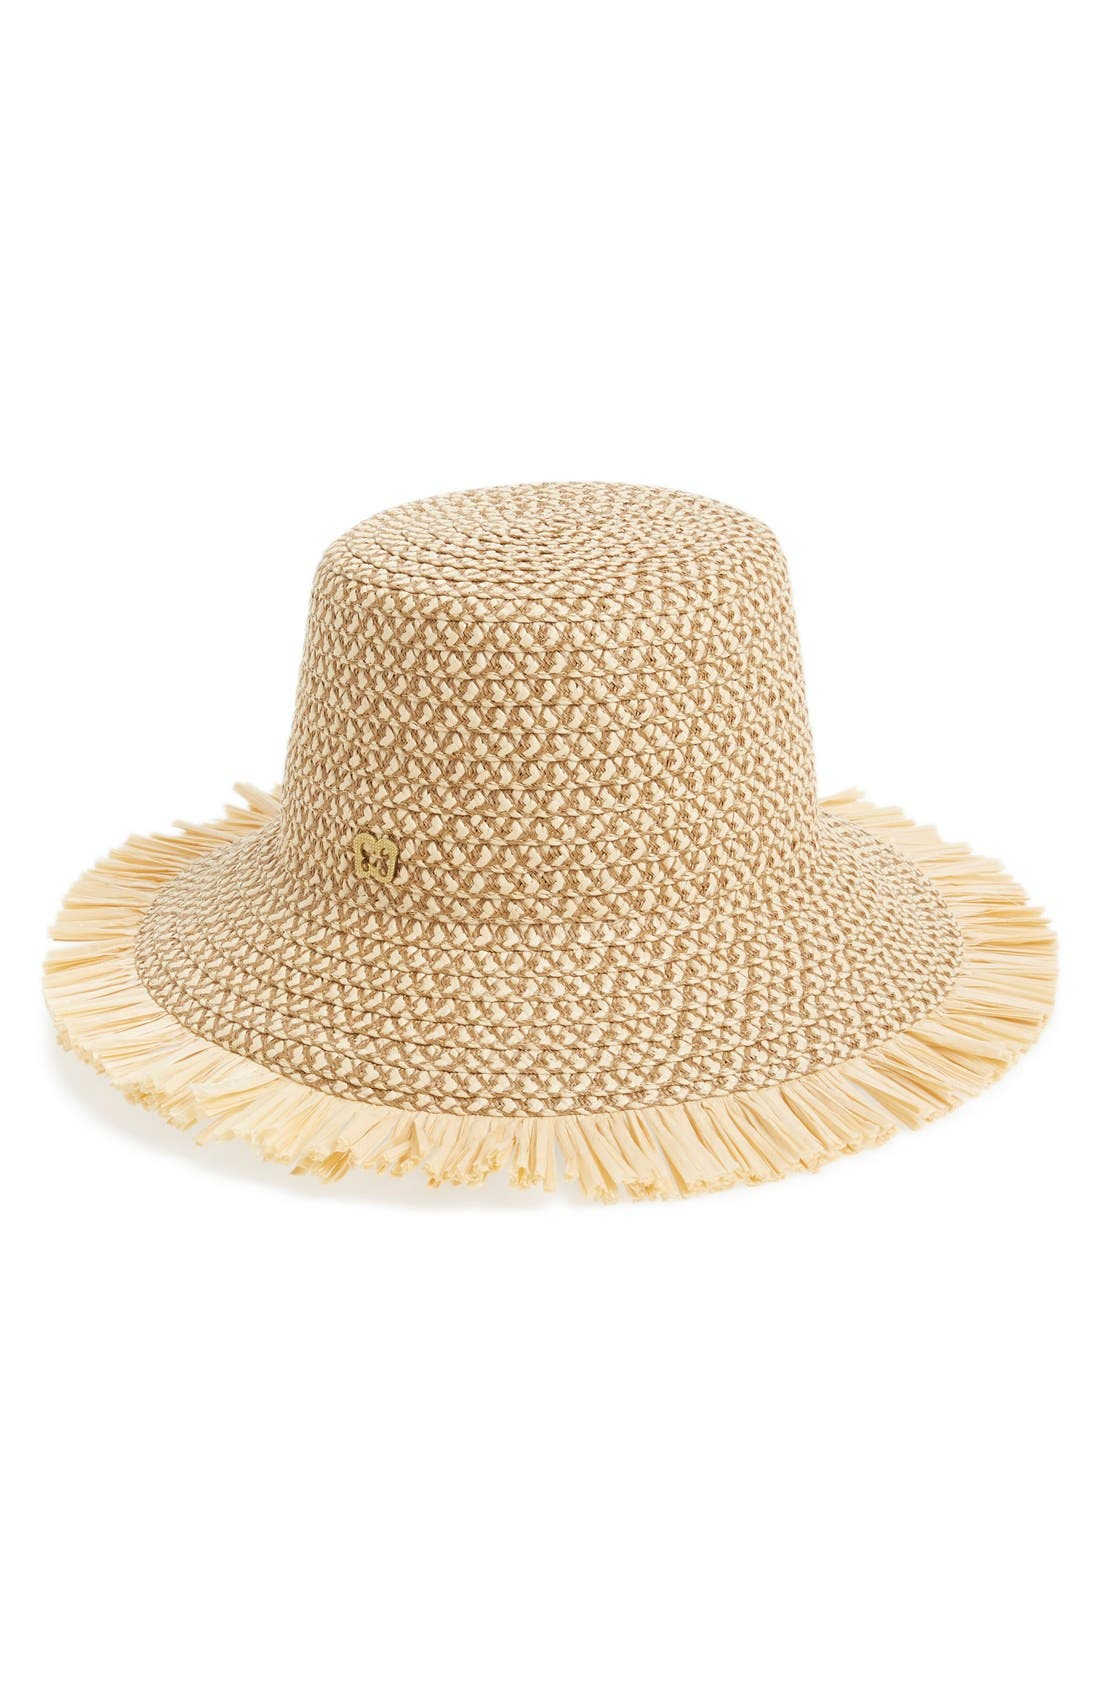 Main Image - Eric Javits 'Tiki' Bucket Hat